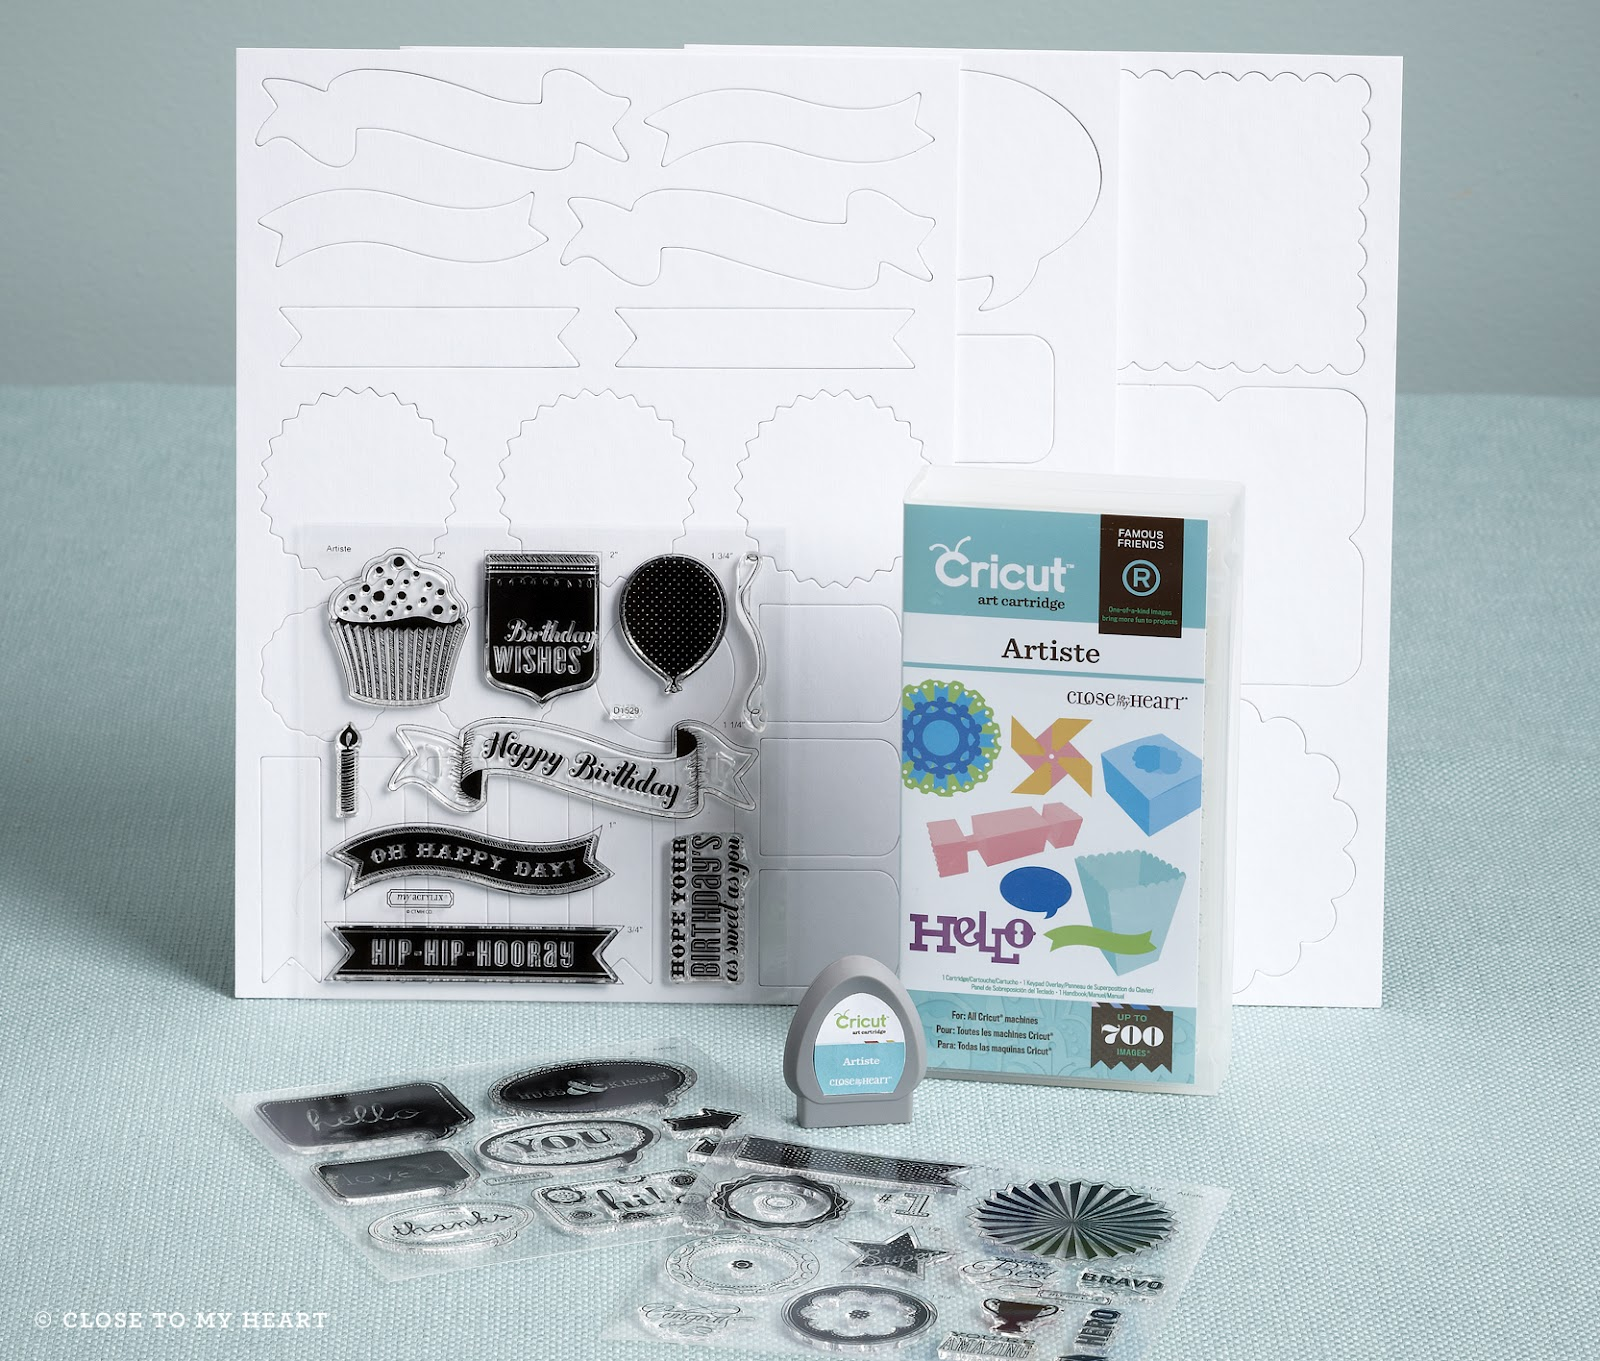 52 best Cricut - Artiste images on Pinterest Paper crafting, Paper Artiste cricut cartridge images